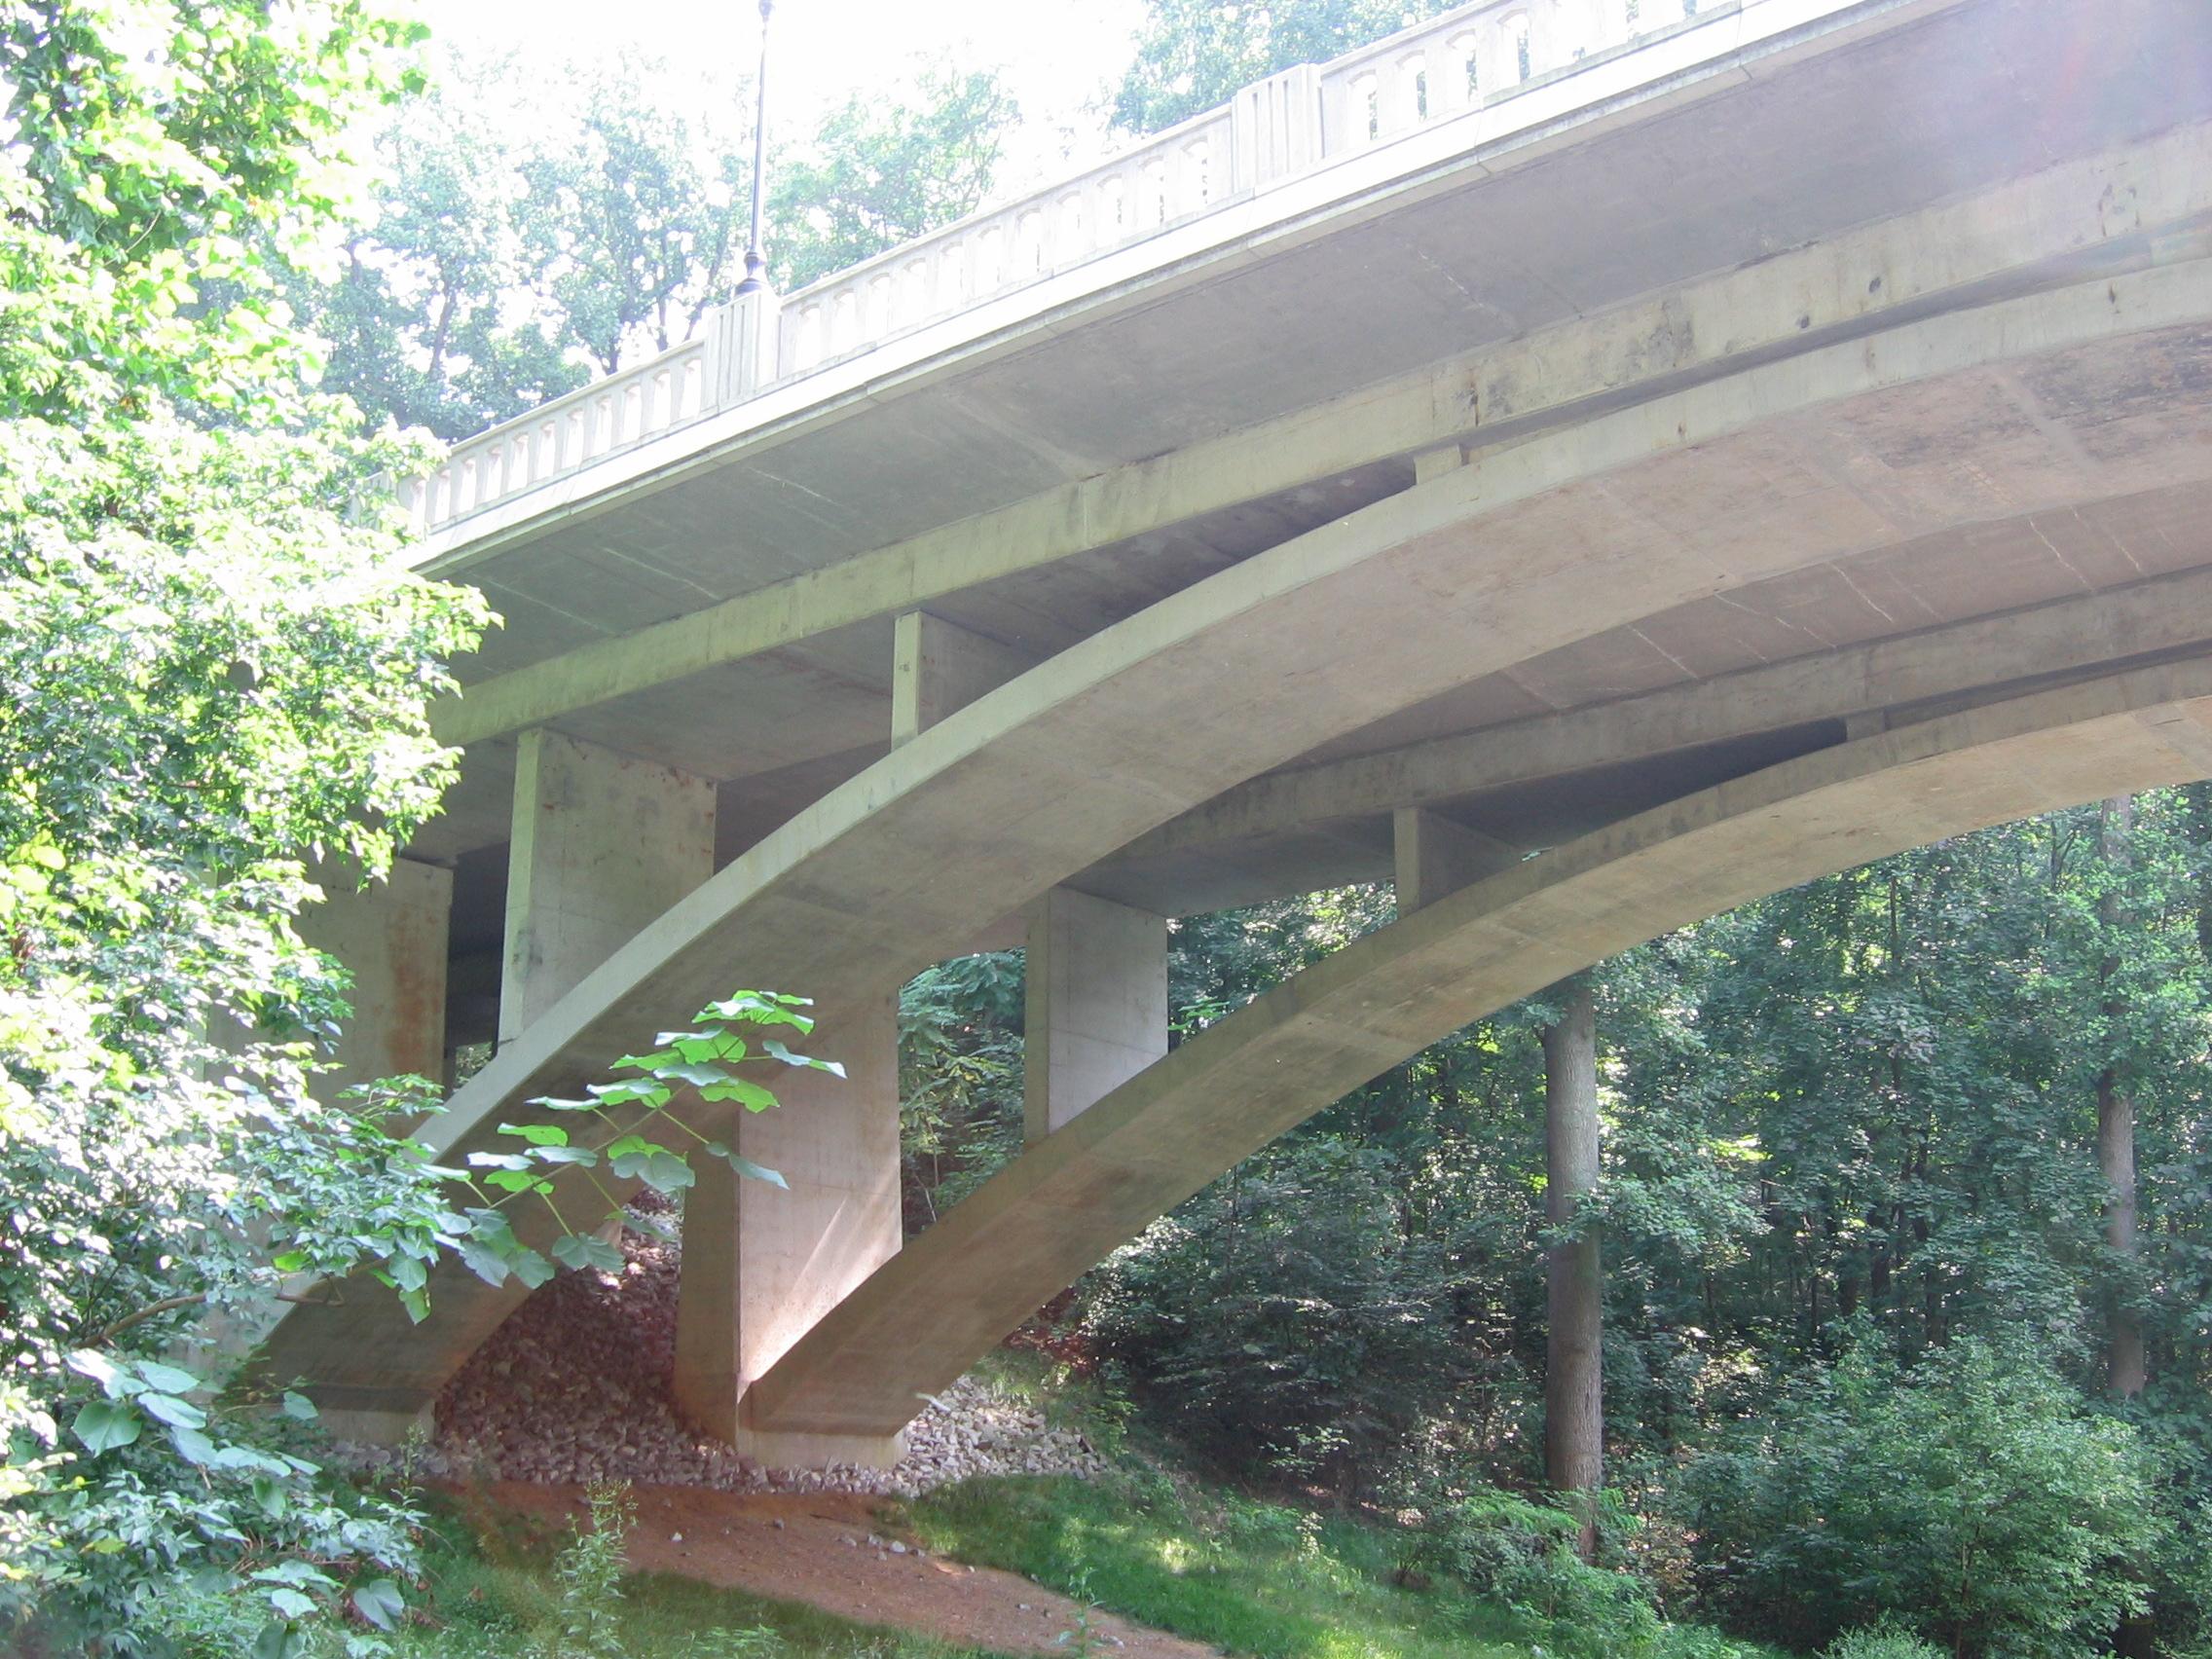 Engineer U0026 39 S Guide To Baltimore  Clifton Avenue Bridge